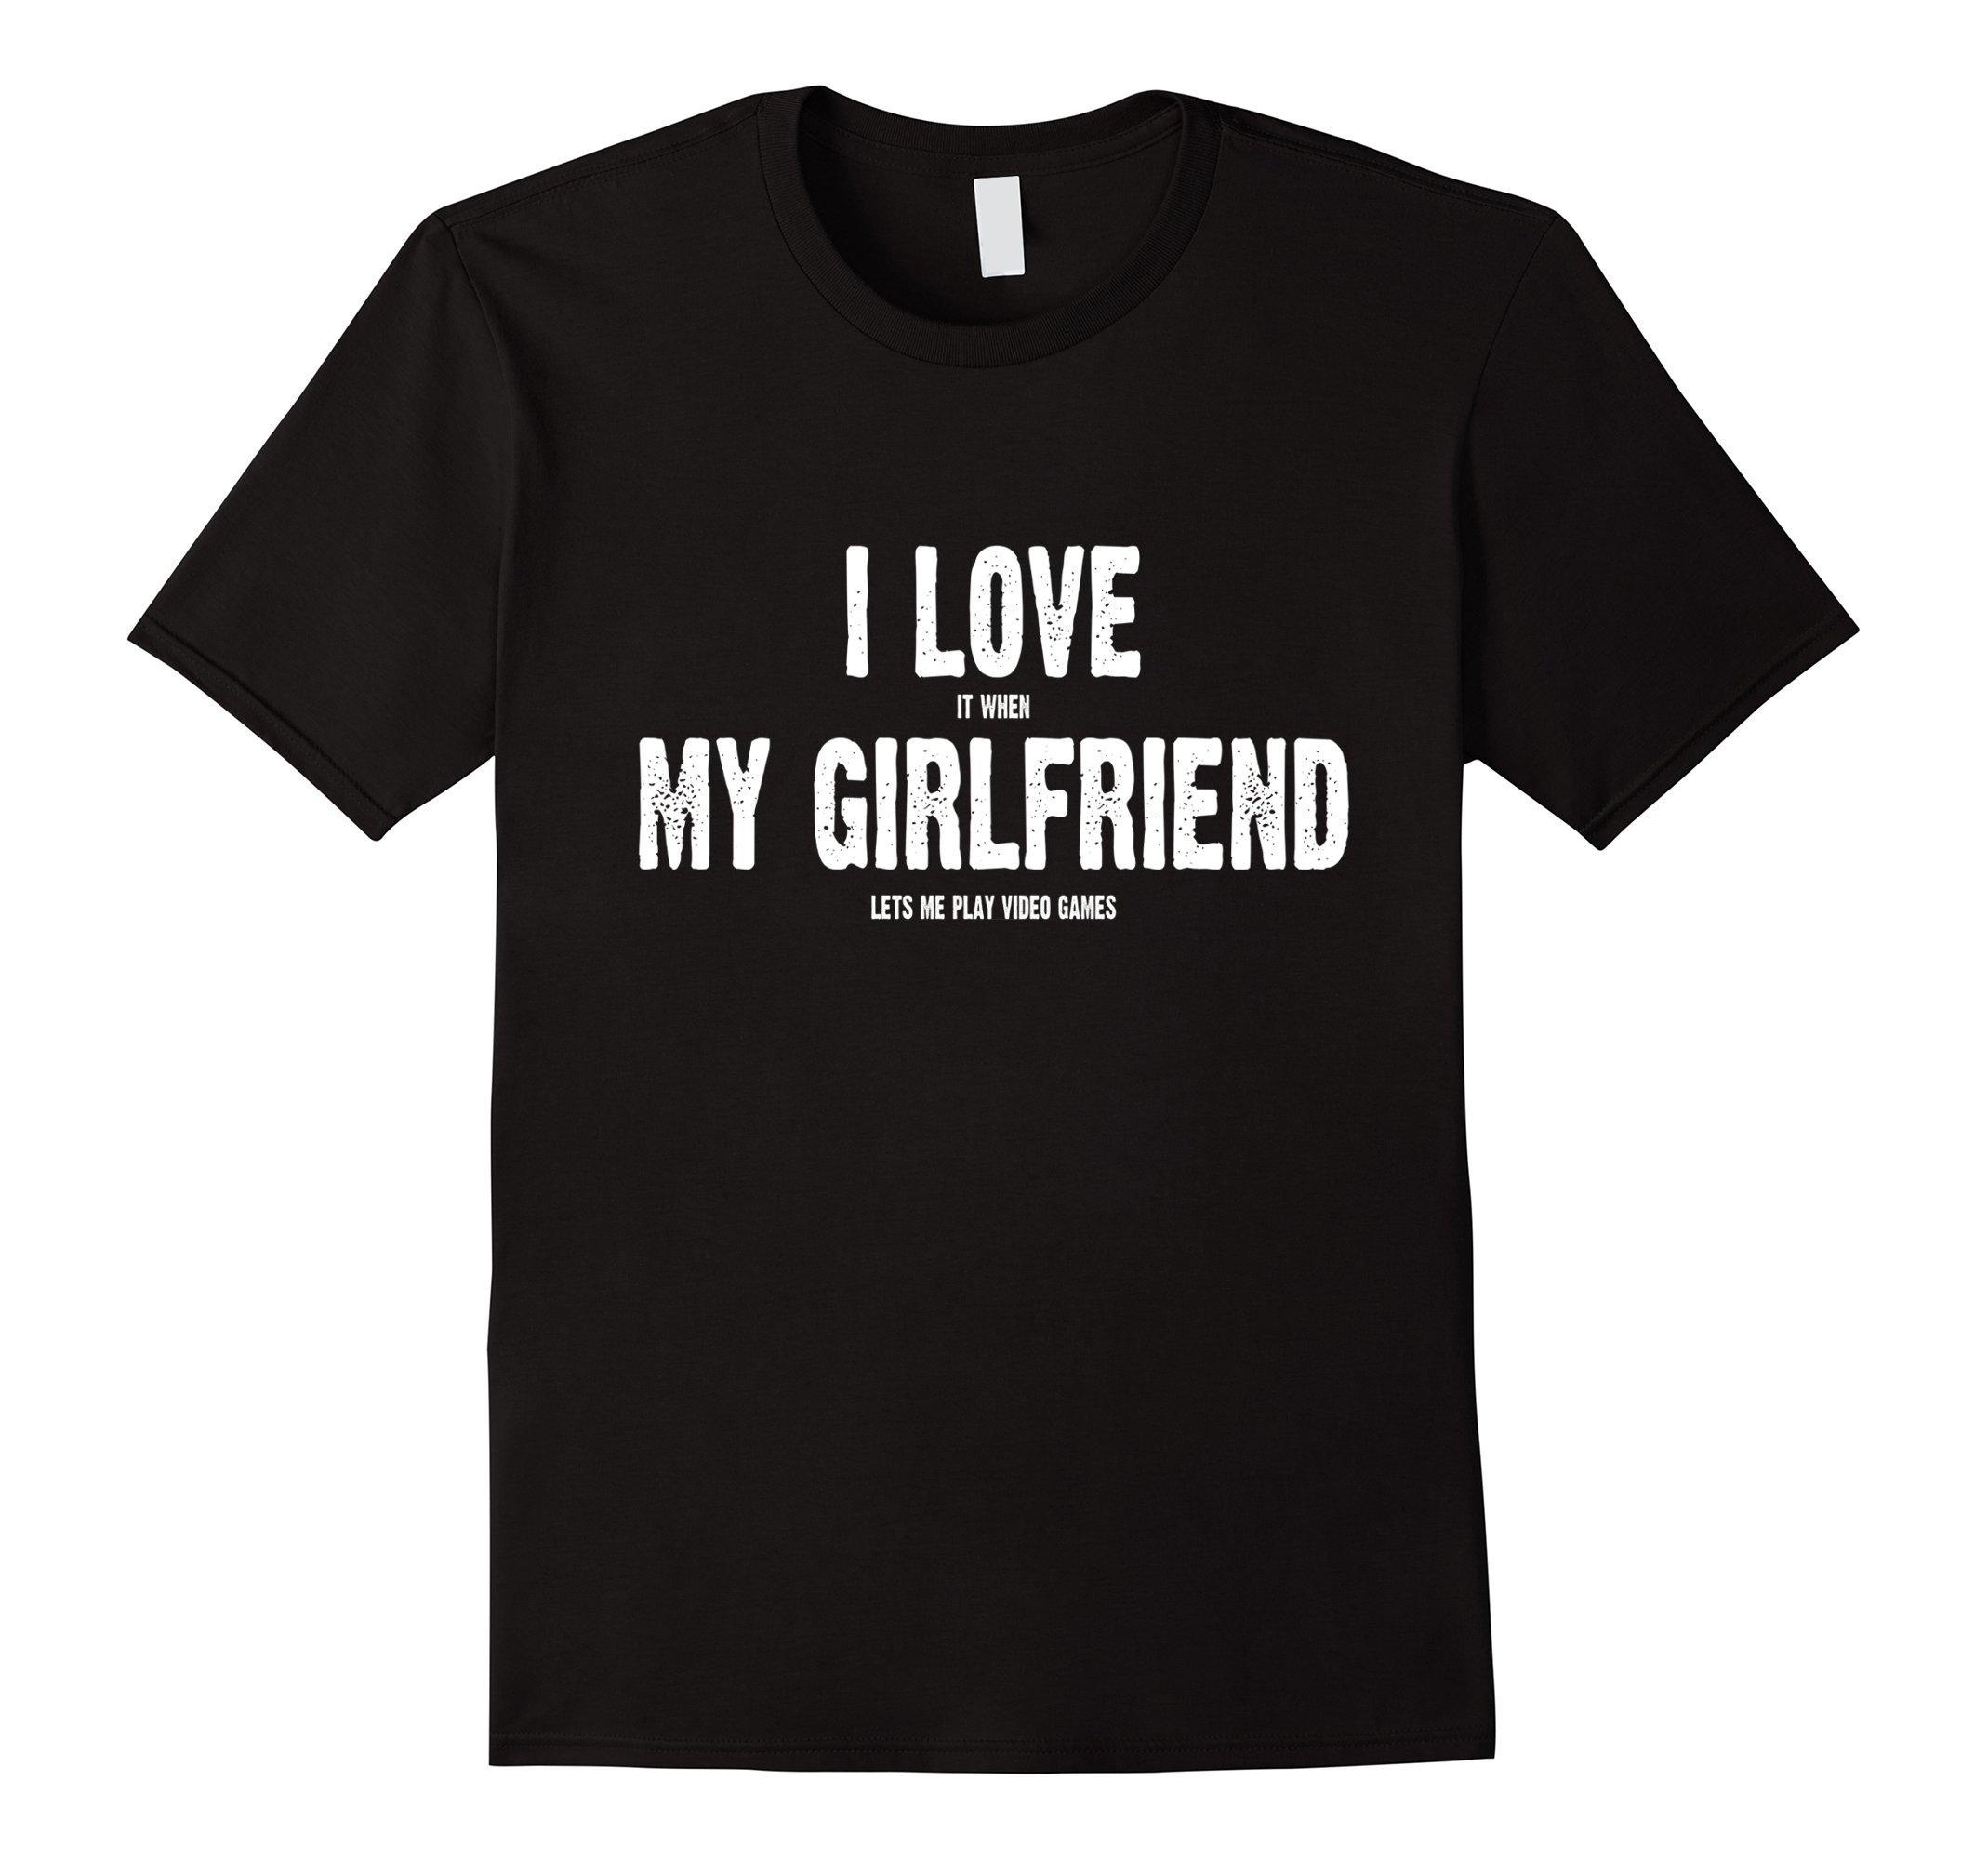 Mens I Love It When My Girlfriend Lets Me Play Video Games Shirt XL Black